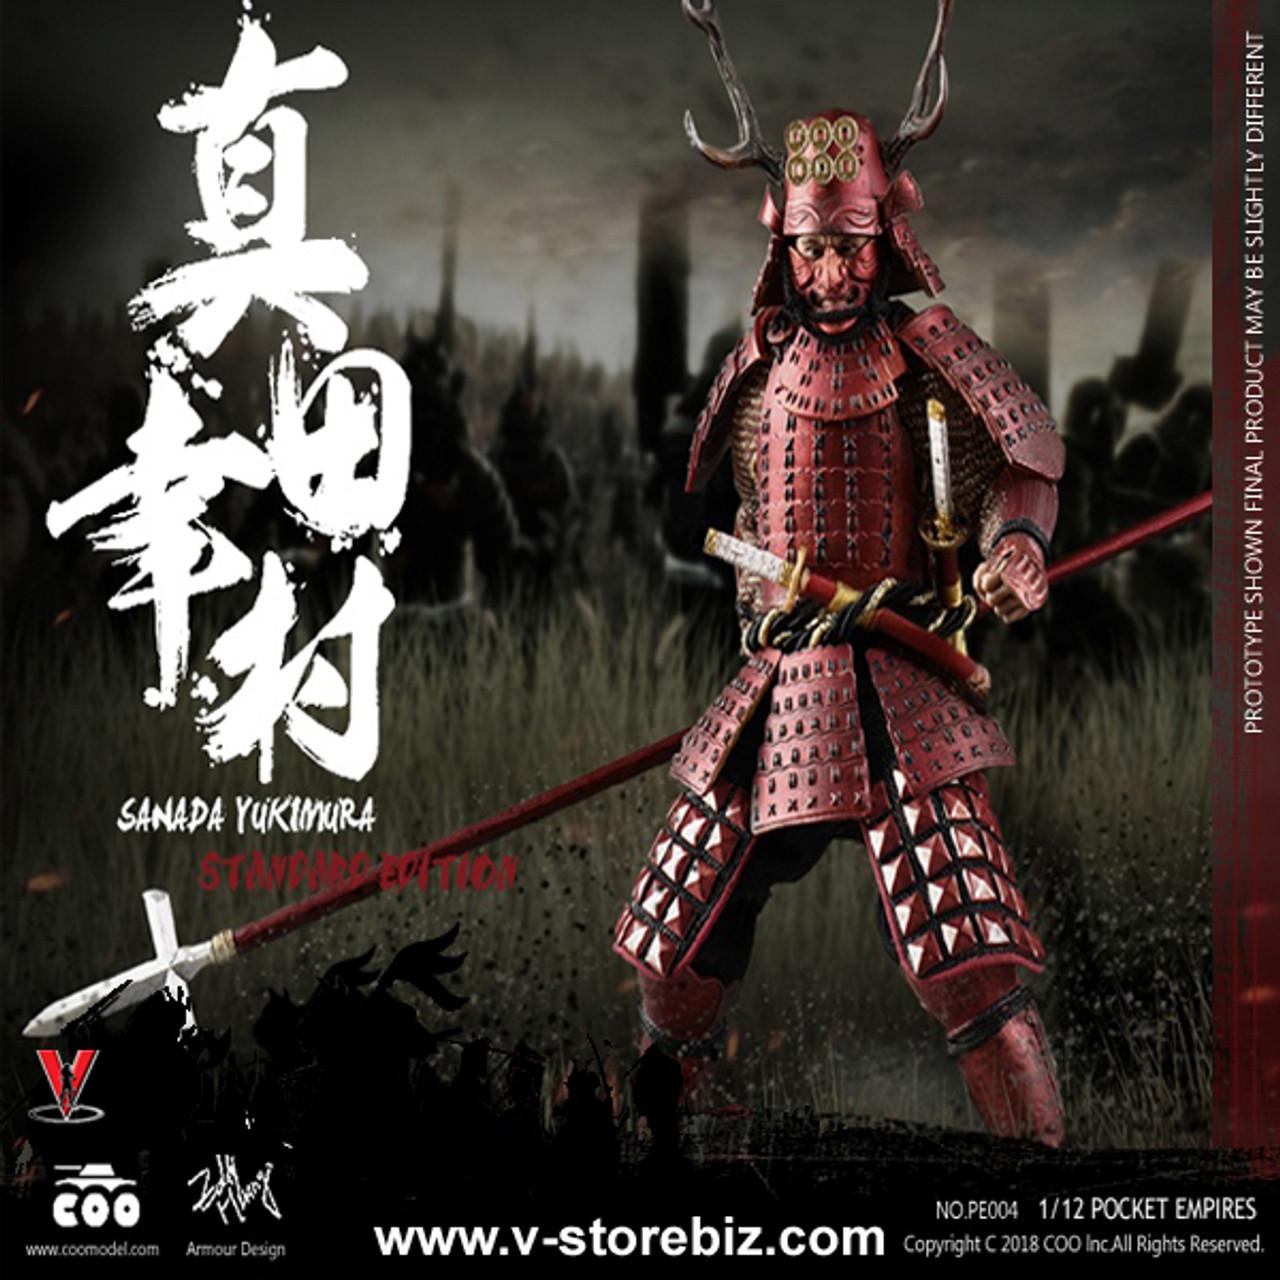 Coo Models Japon Samouraï Sanada Yukimura Metal Body Armour loose 1//6th scale